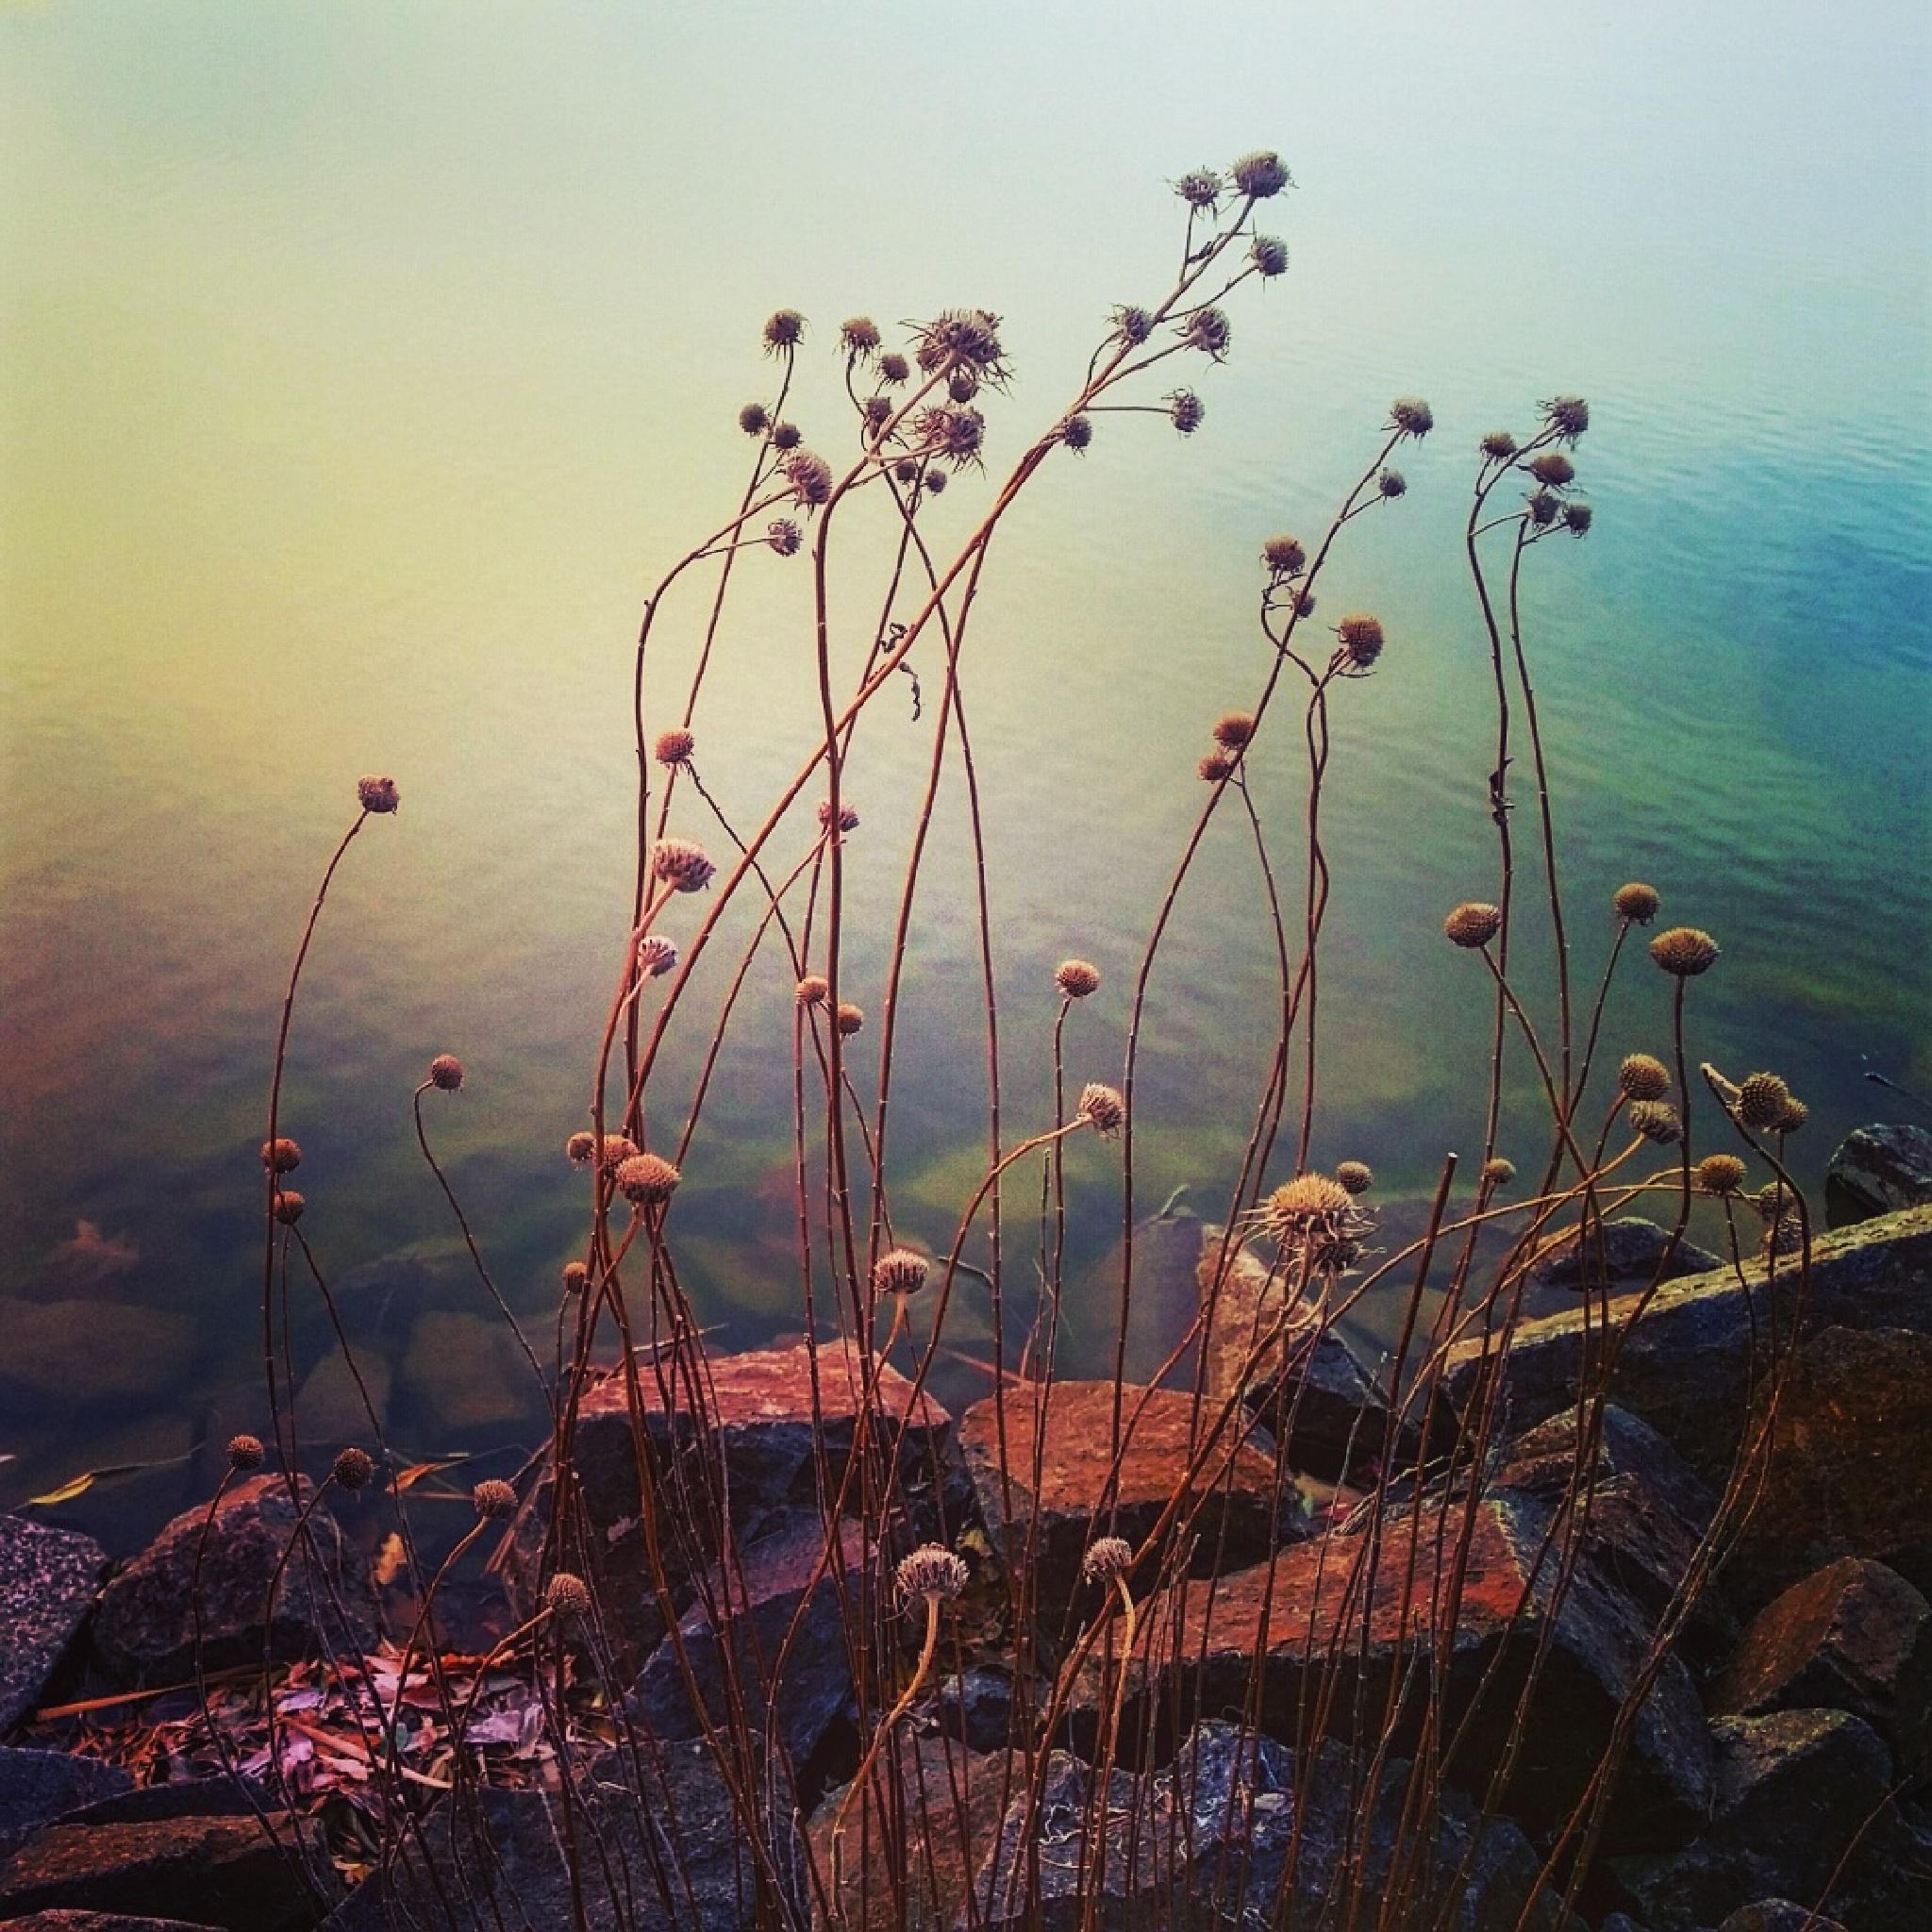 Graceful stems by Mary Ellen Sanger